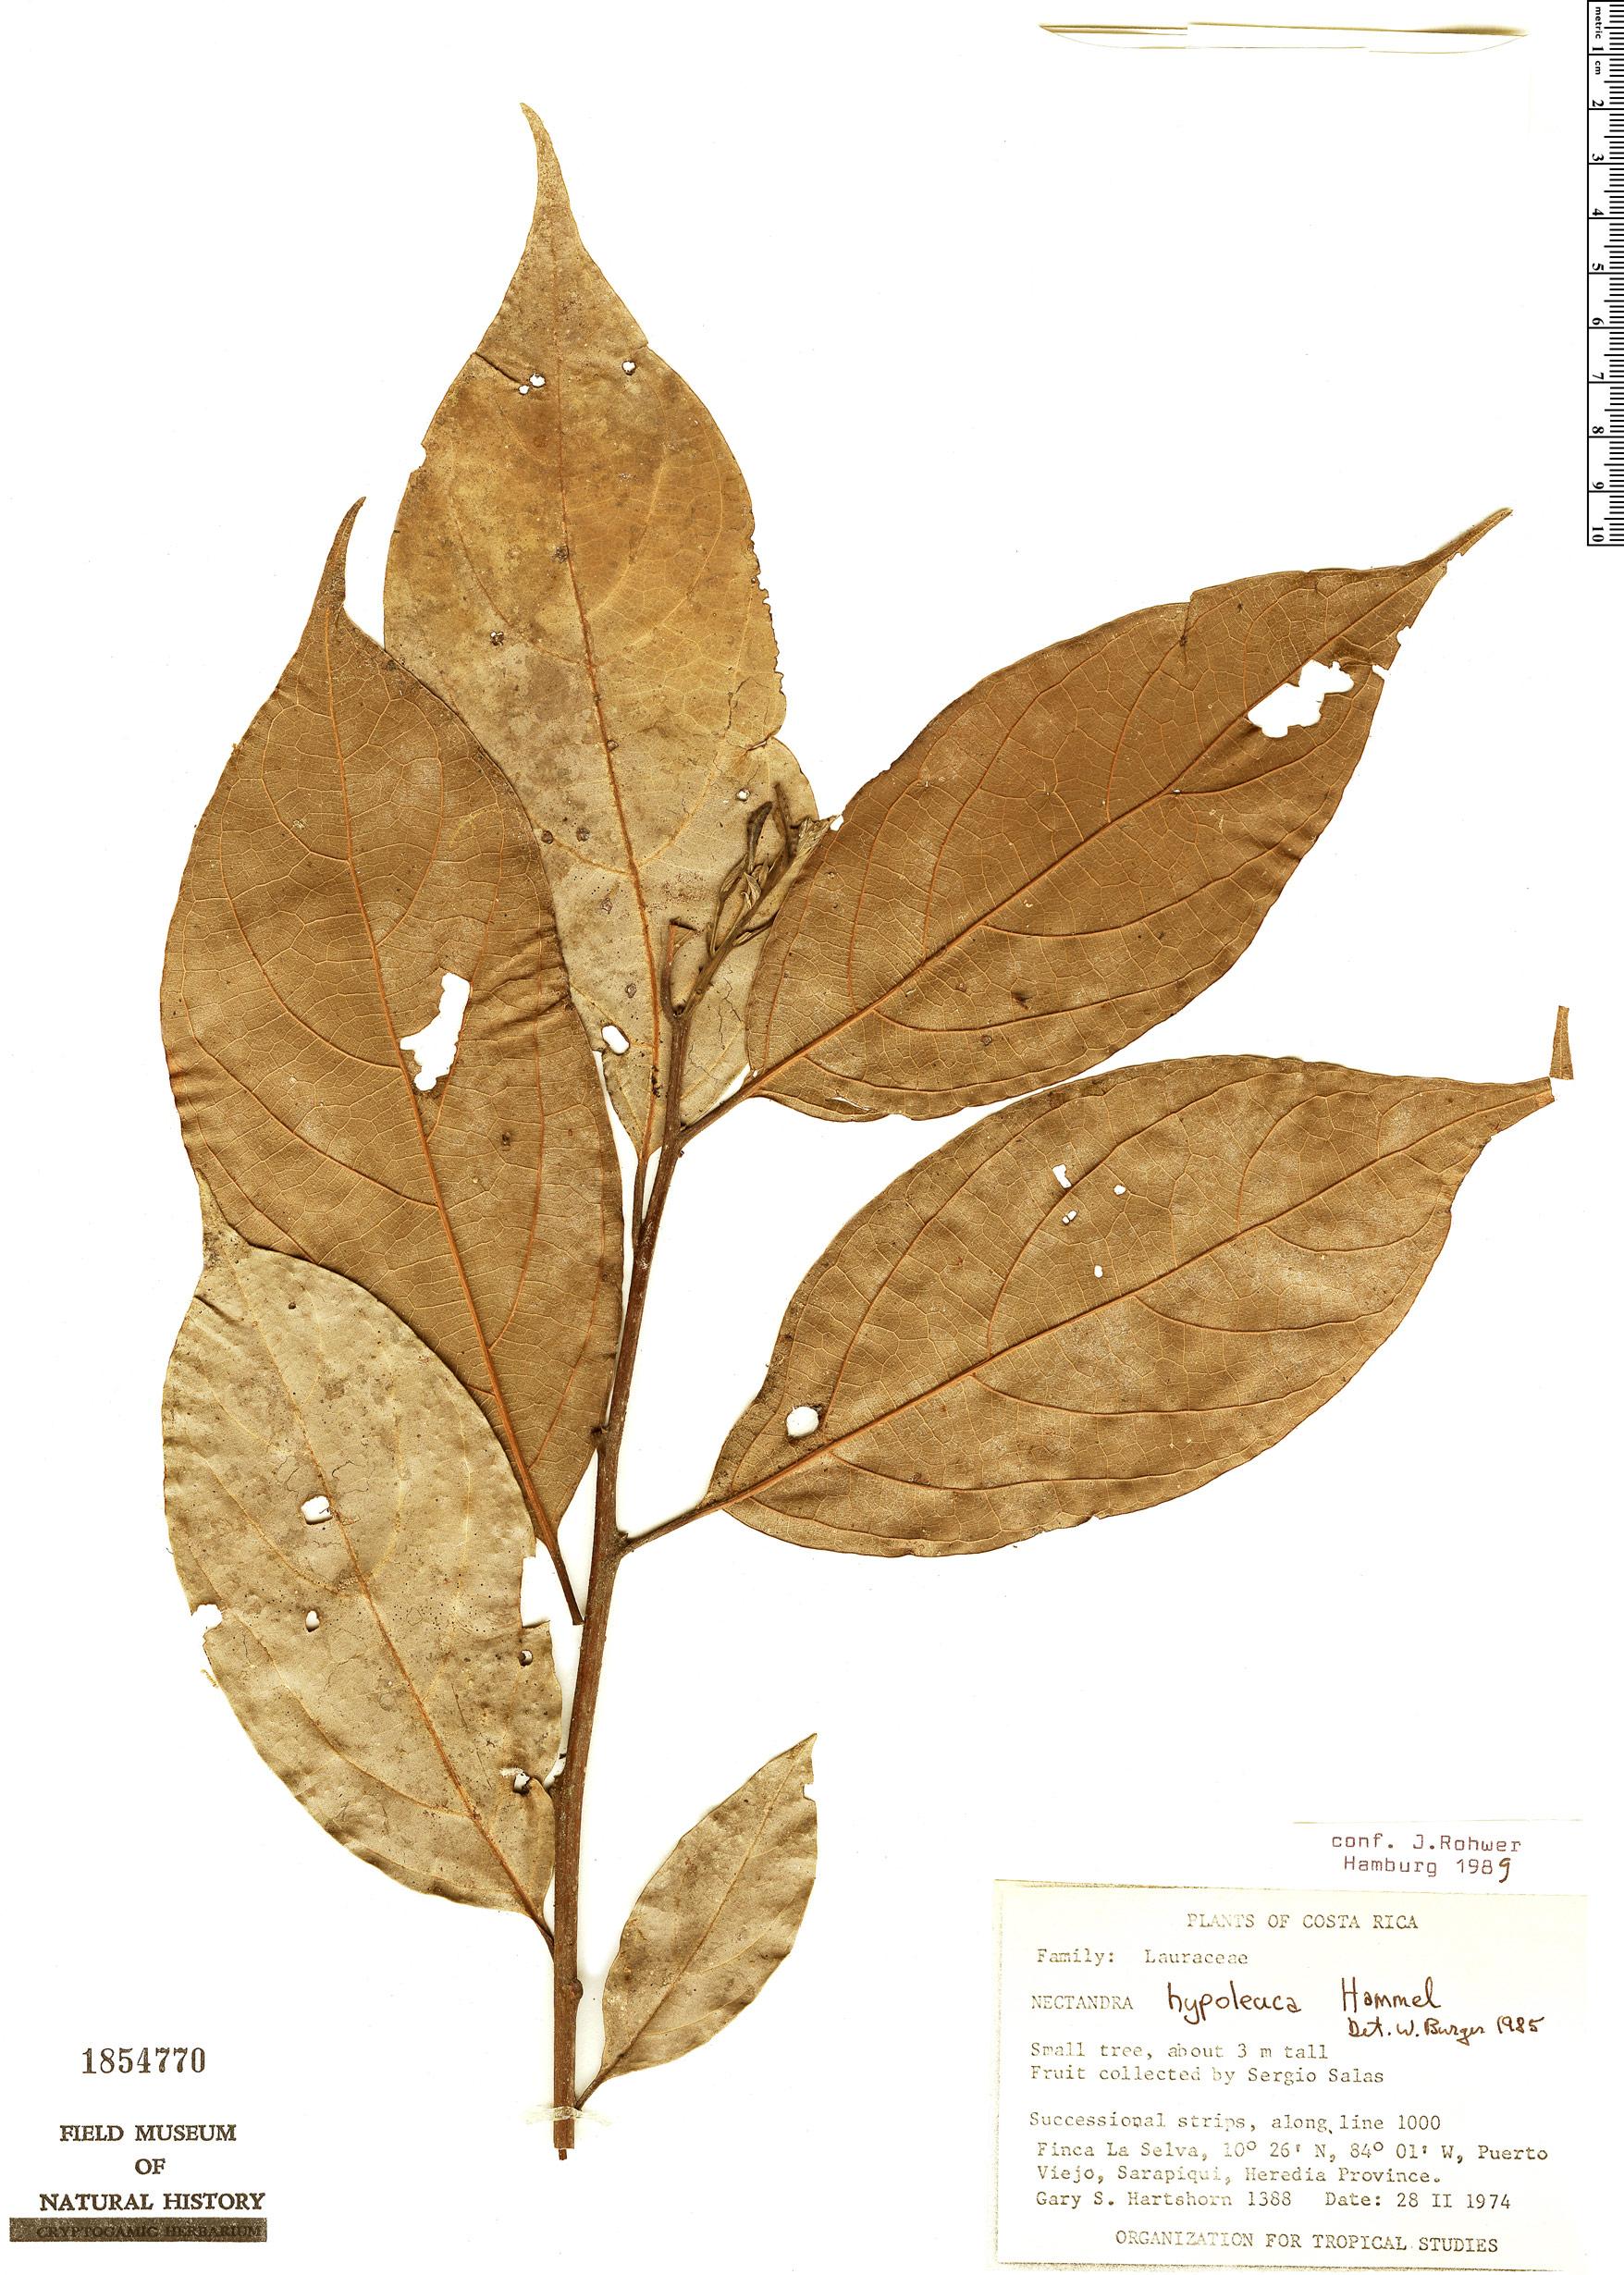 Specimen: Nectandra hypoleuca